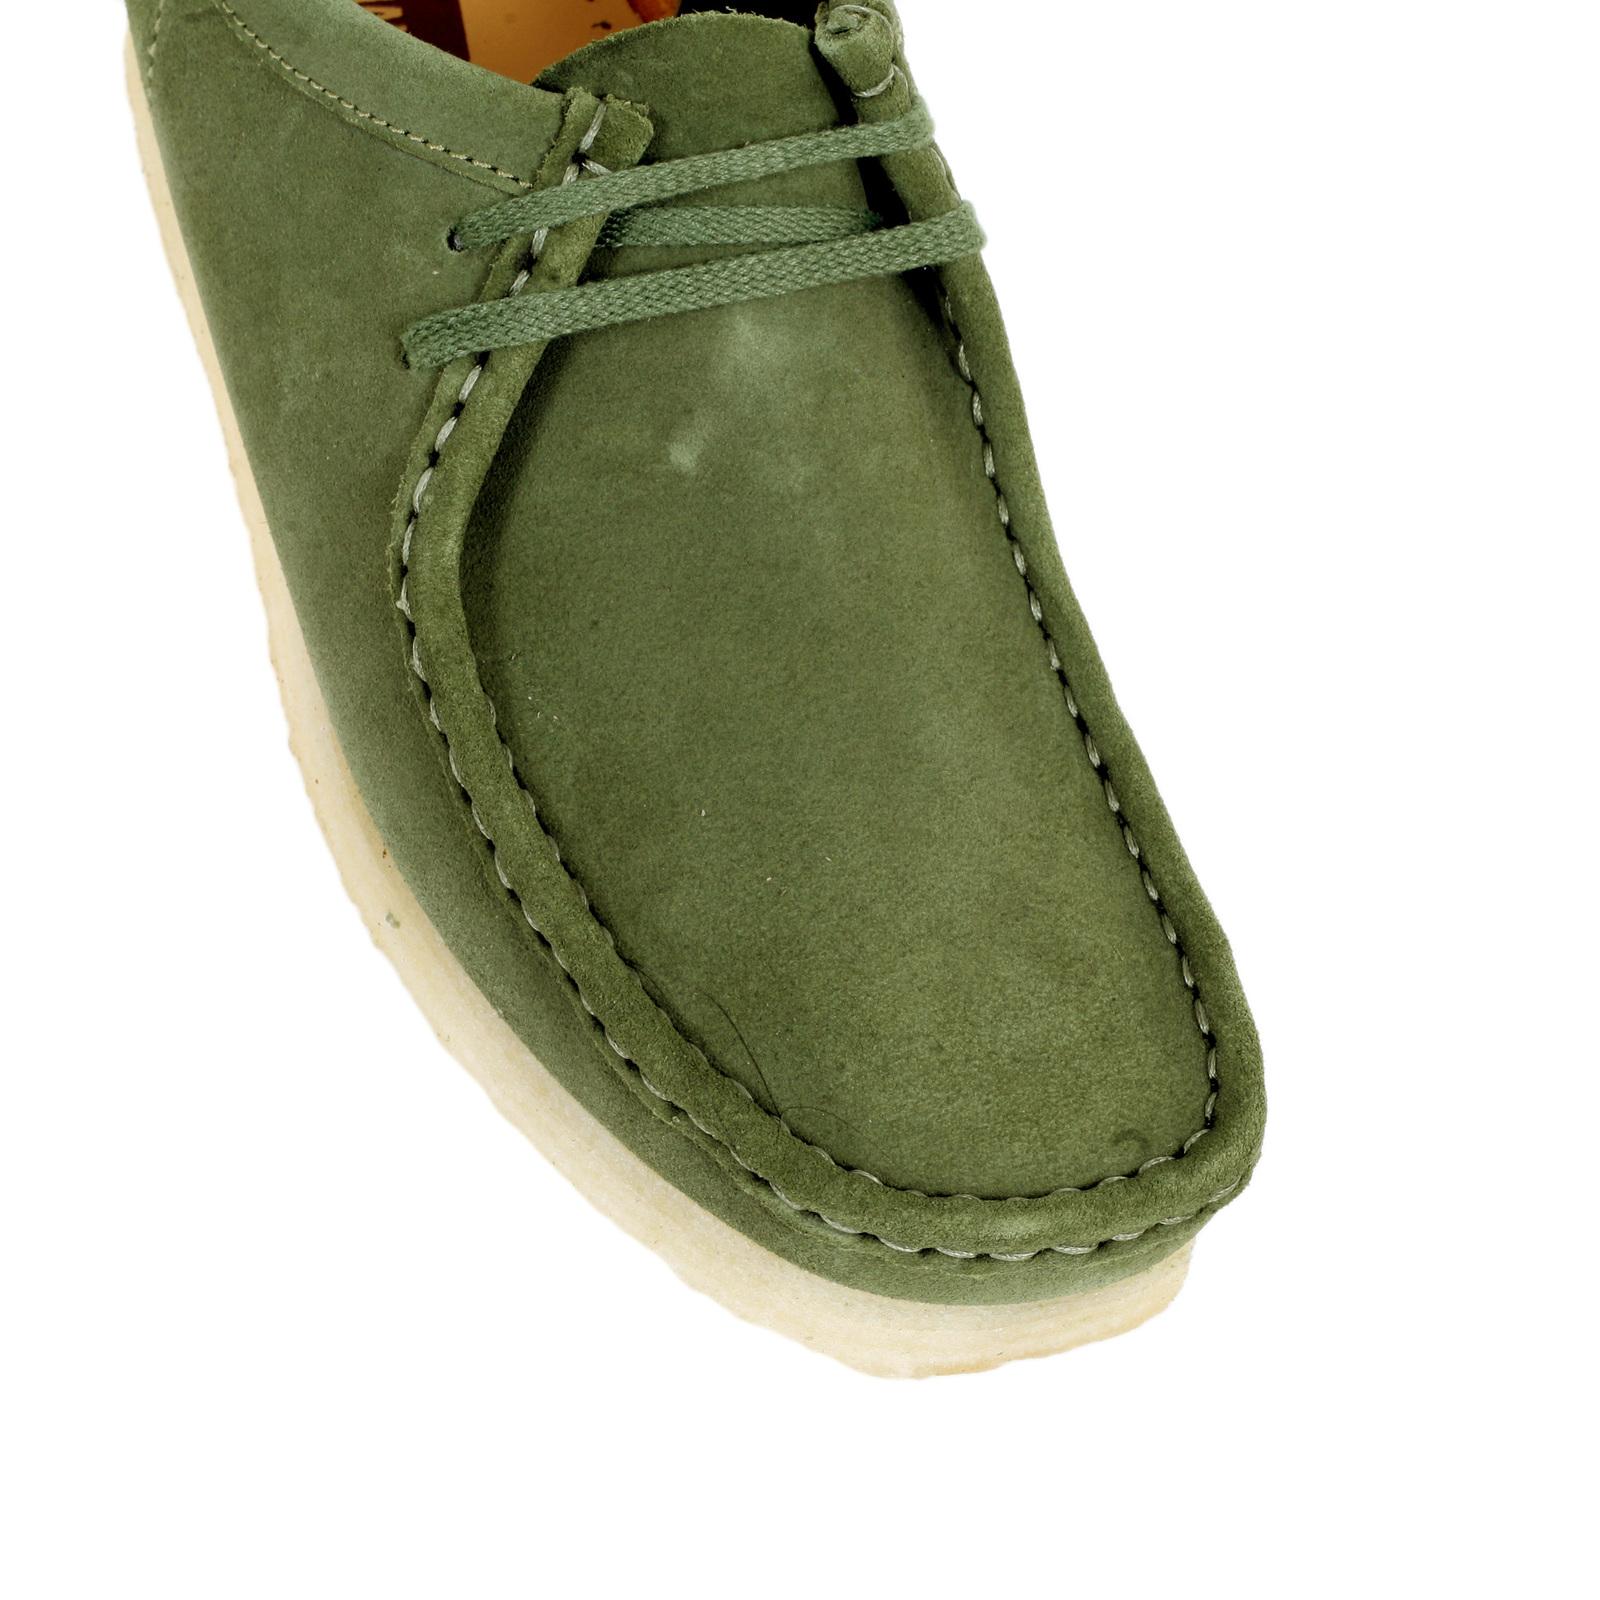 Clarks Originals Wallabee Men/'s Leaf Green Suede 26114504